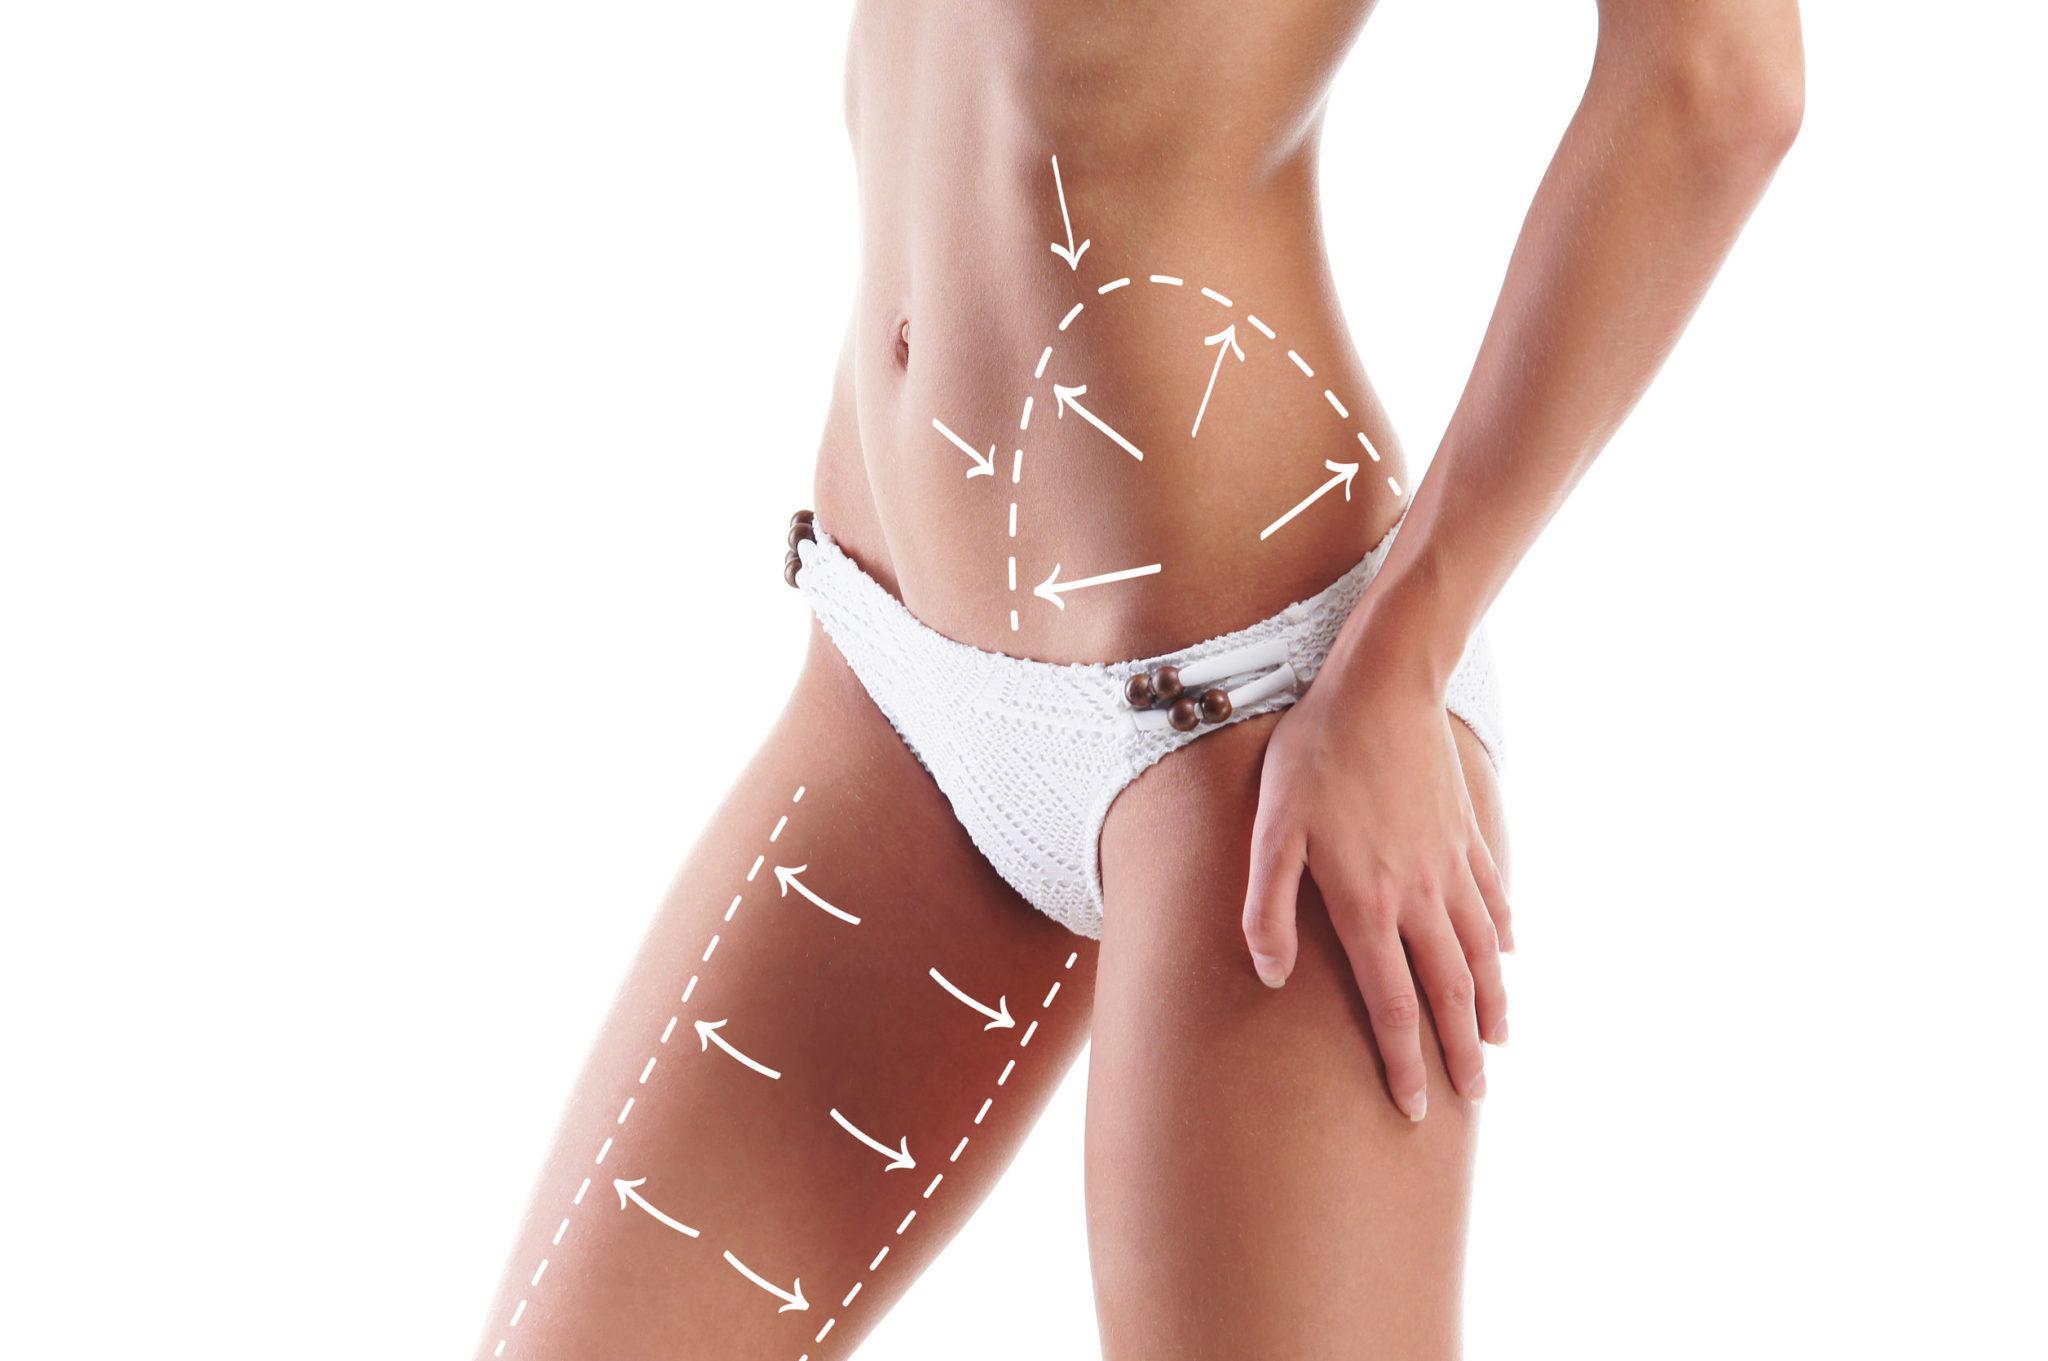 Body Plastic Surgery Charleston, SC